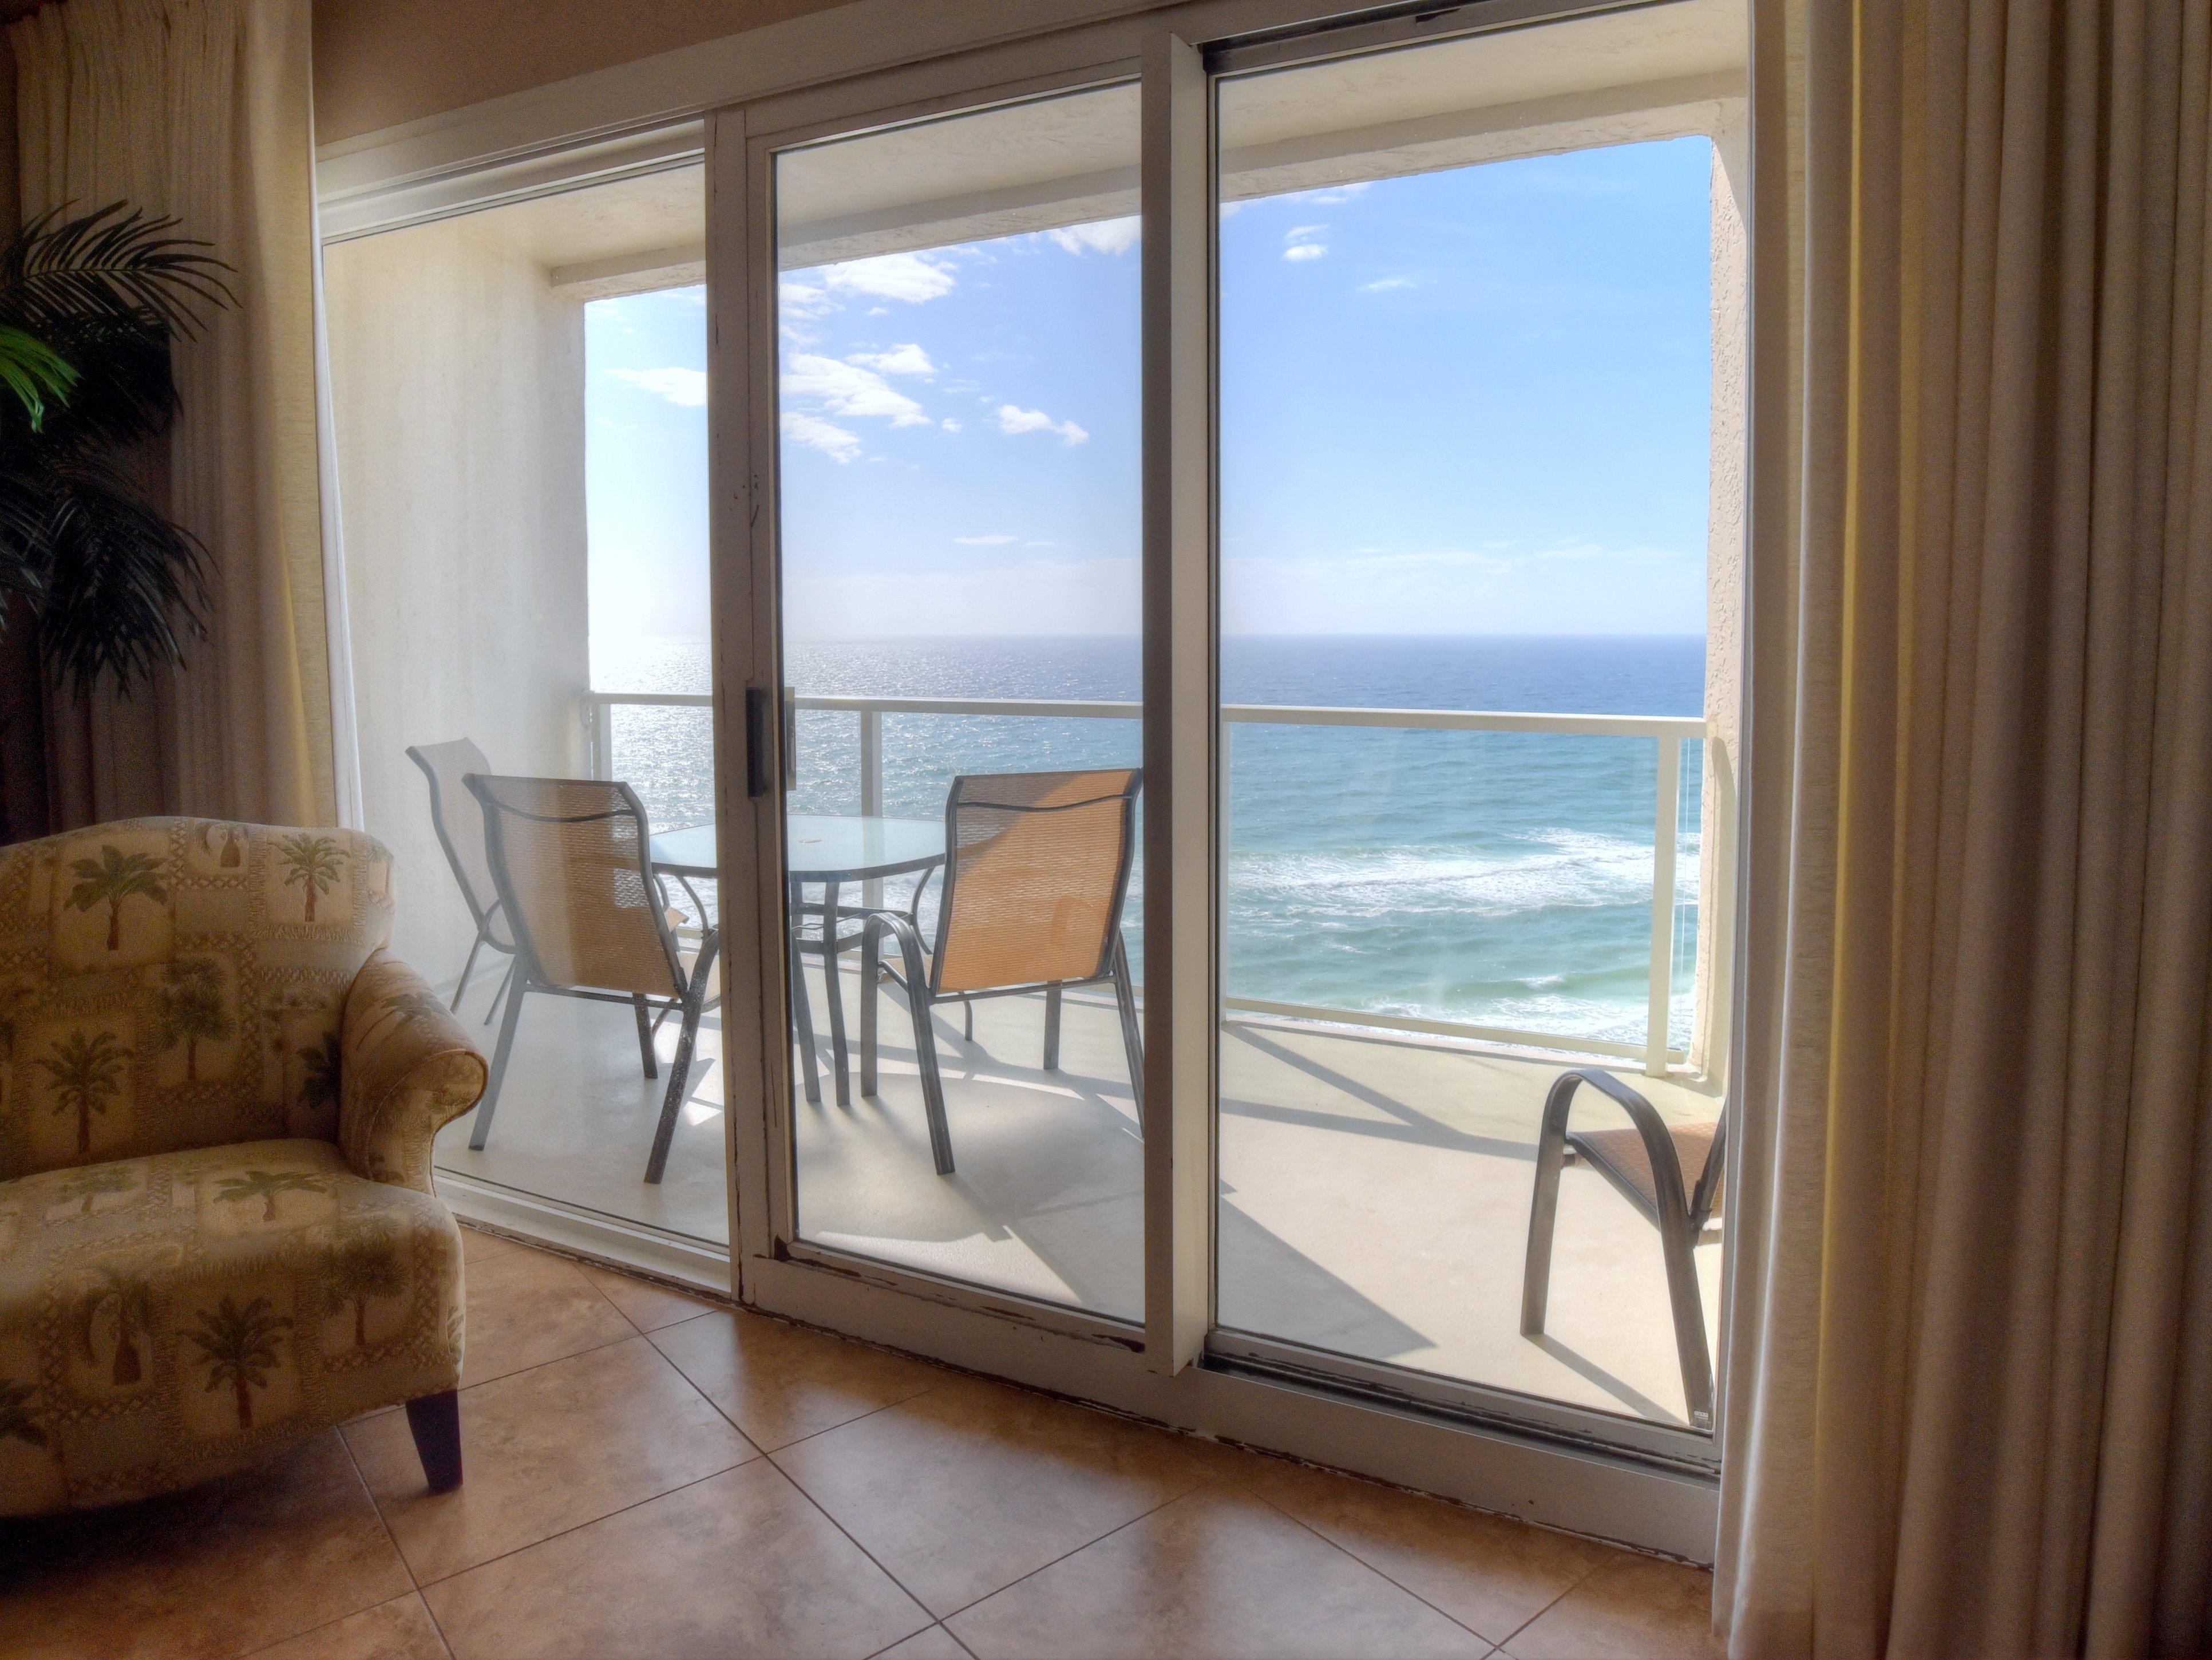 4362 Beachside Two Condo rental in Beachside Towers at Sandestin in Destin Florida - #9